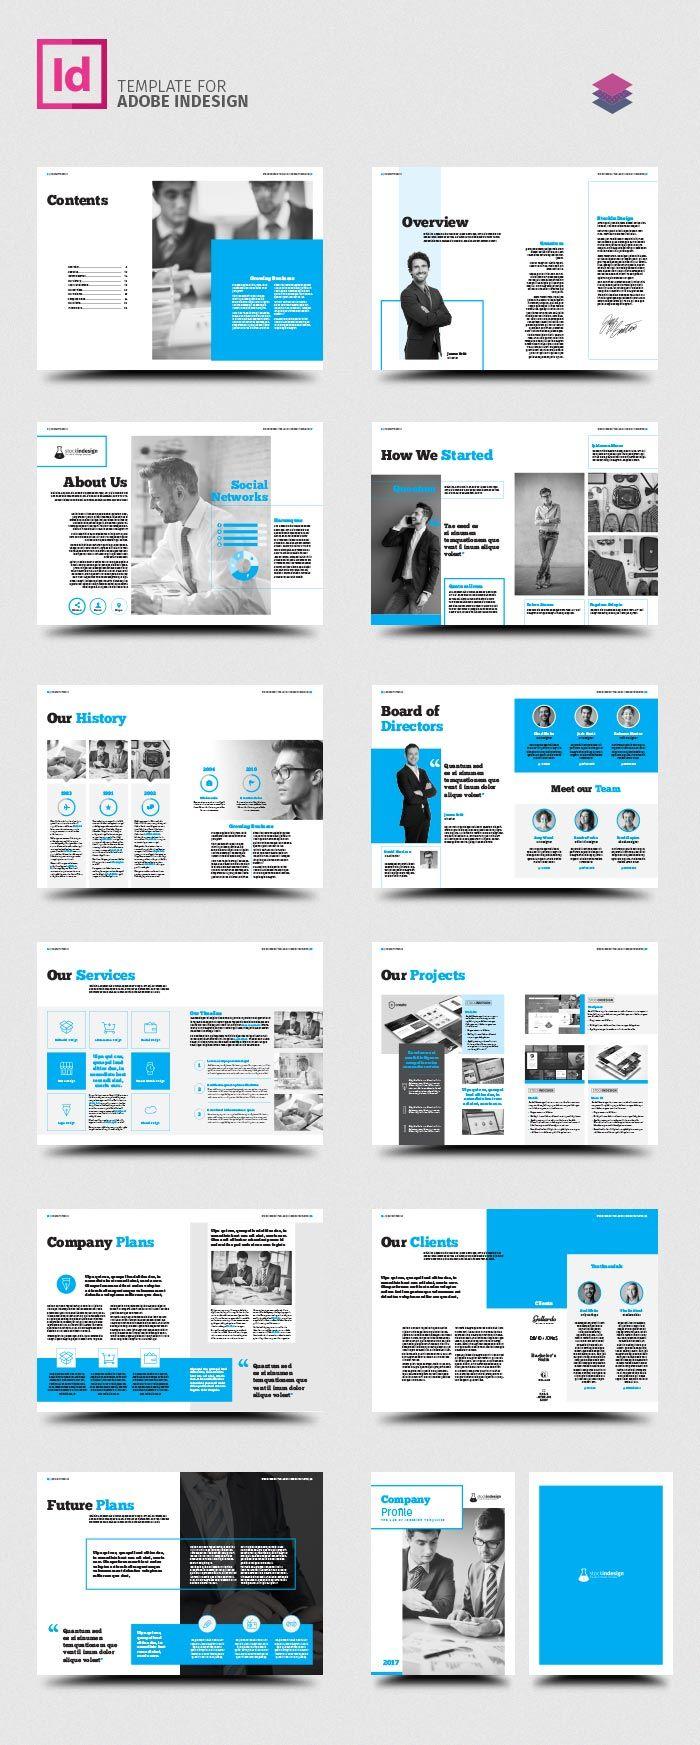 25 best ideas about Company profile – Company Profile Template